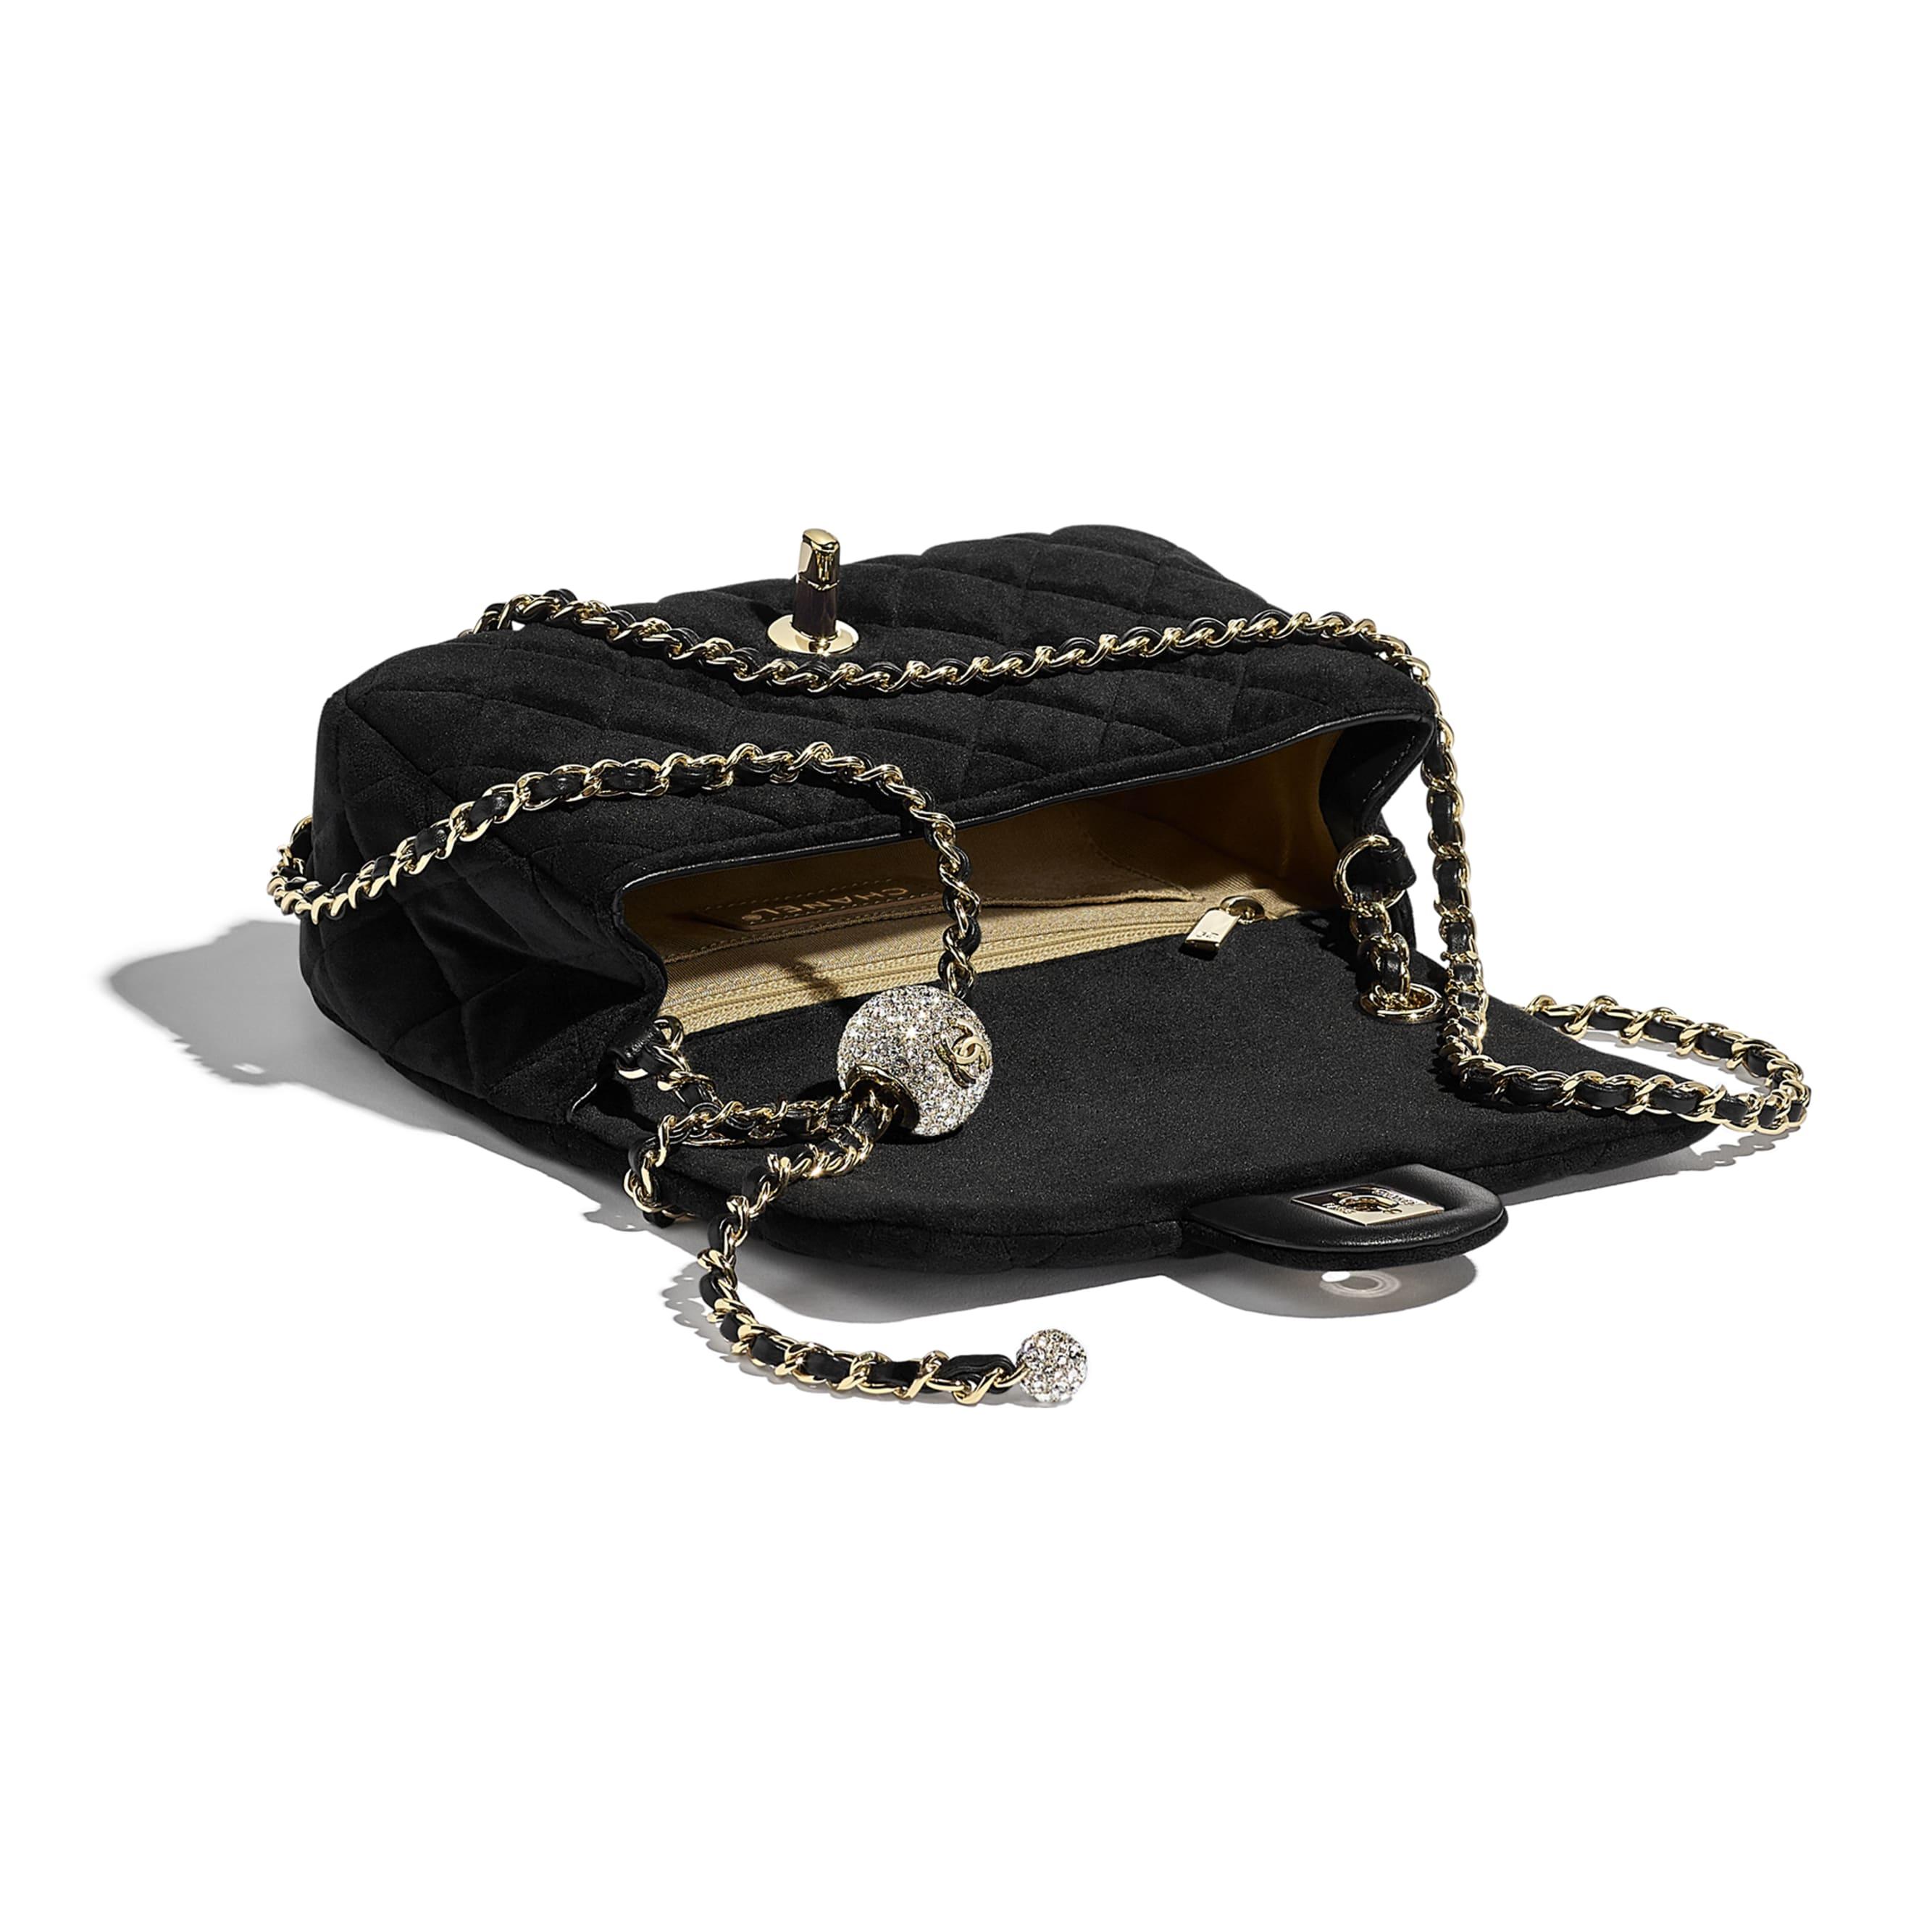 Flap Bag - Black - Velvet, Diamanté & Gold-Tone Metal - CHANEL - Other view - see standard sized version